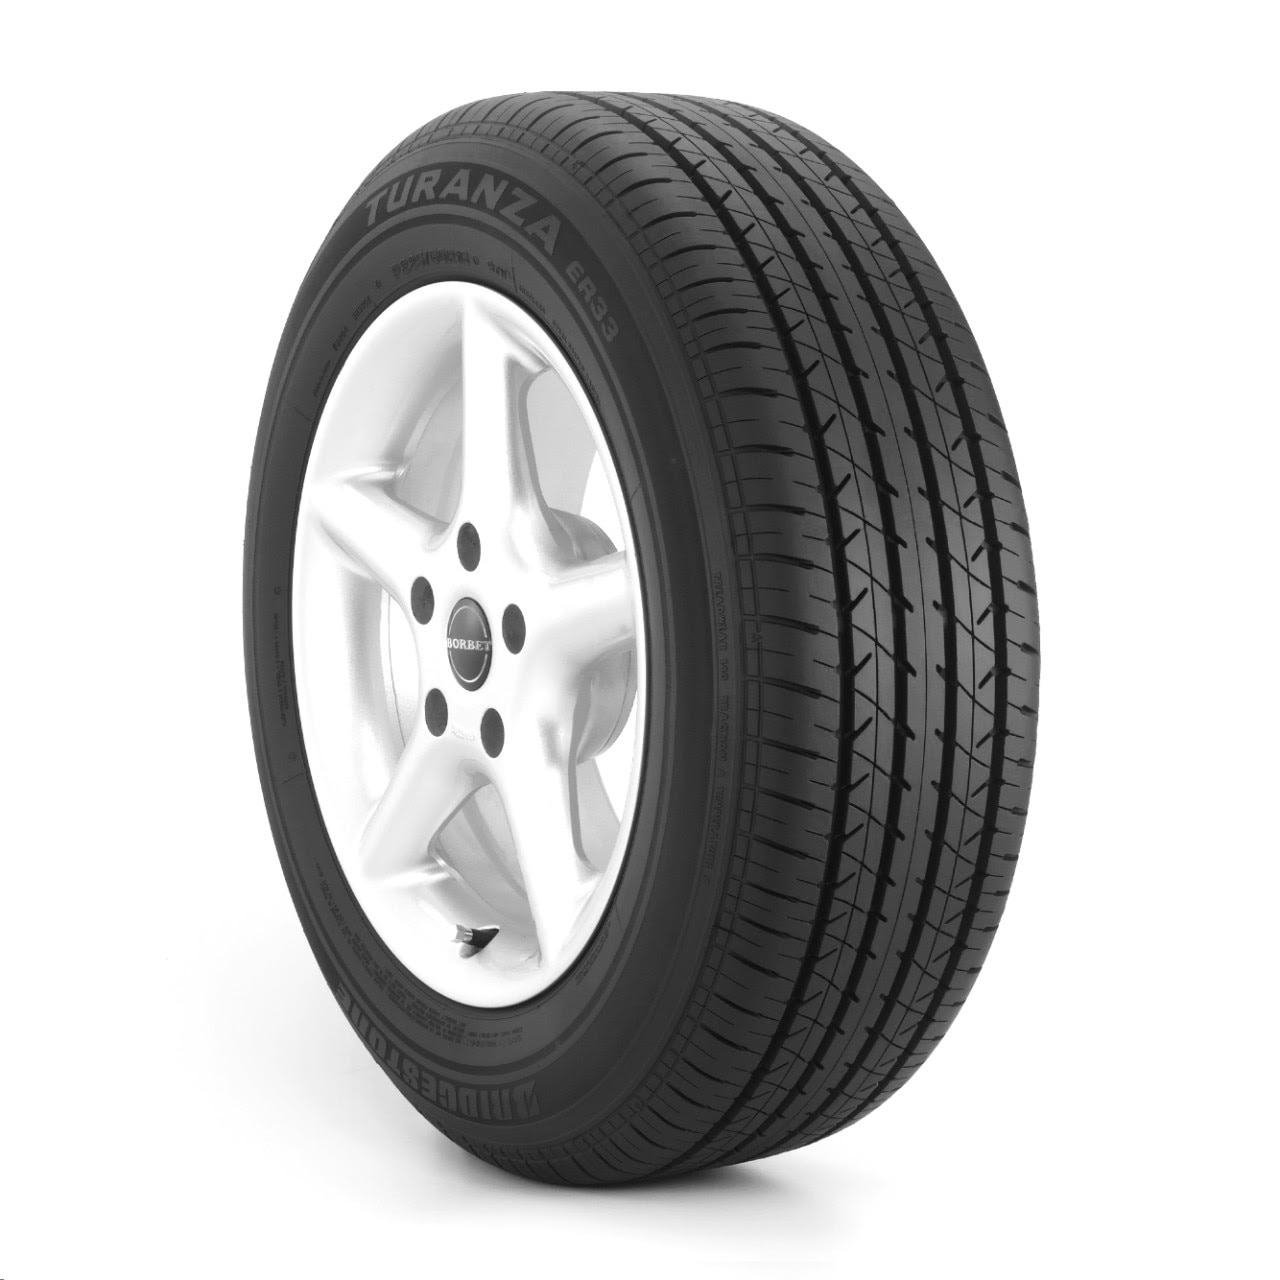 Turanza Er33 Rft Touring Car Tire Bridgestone